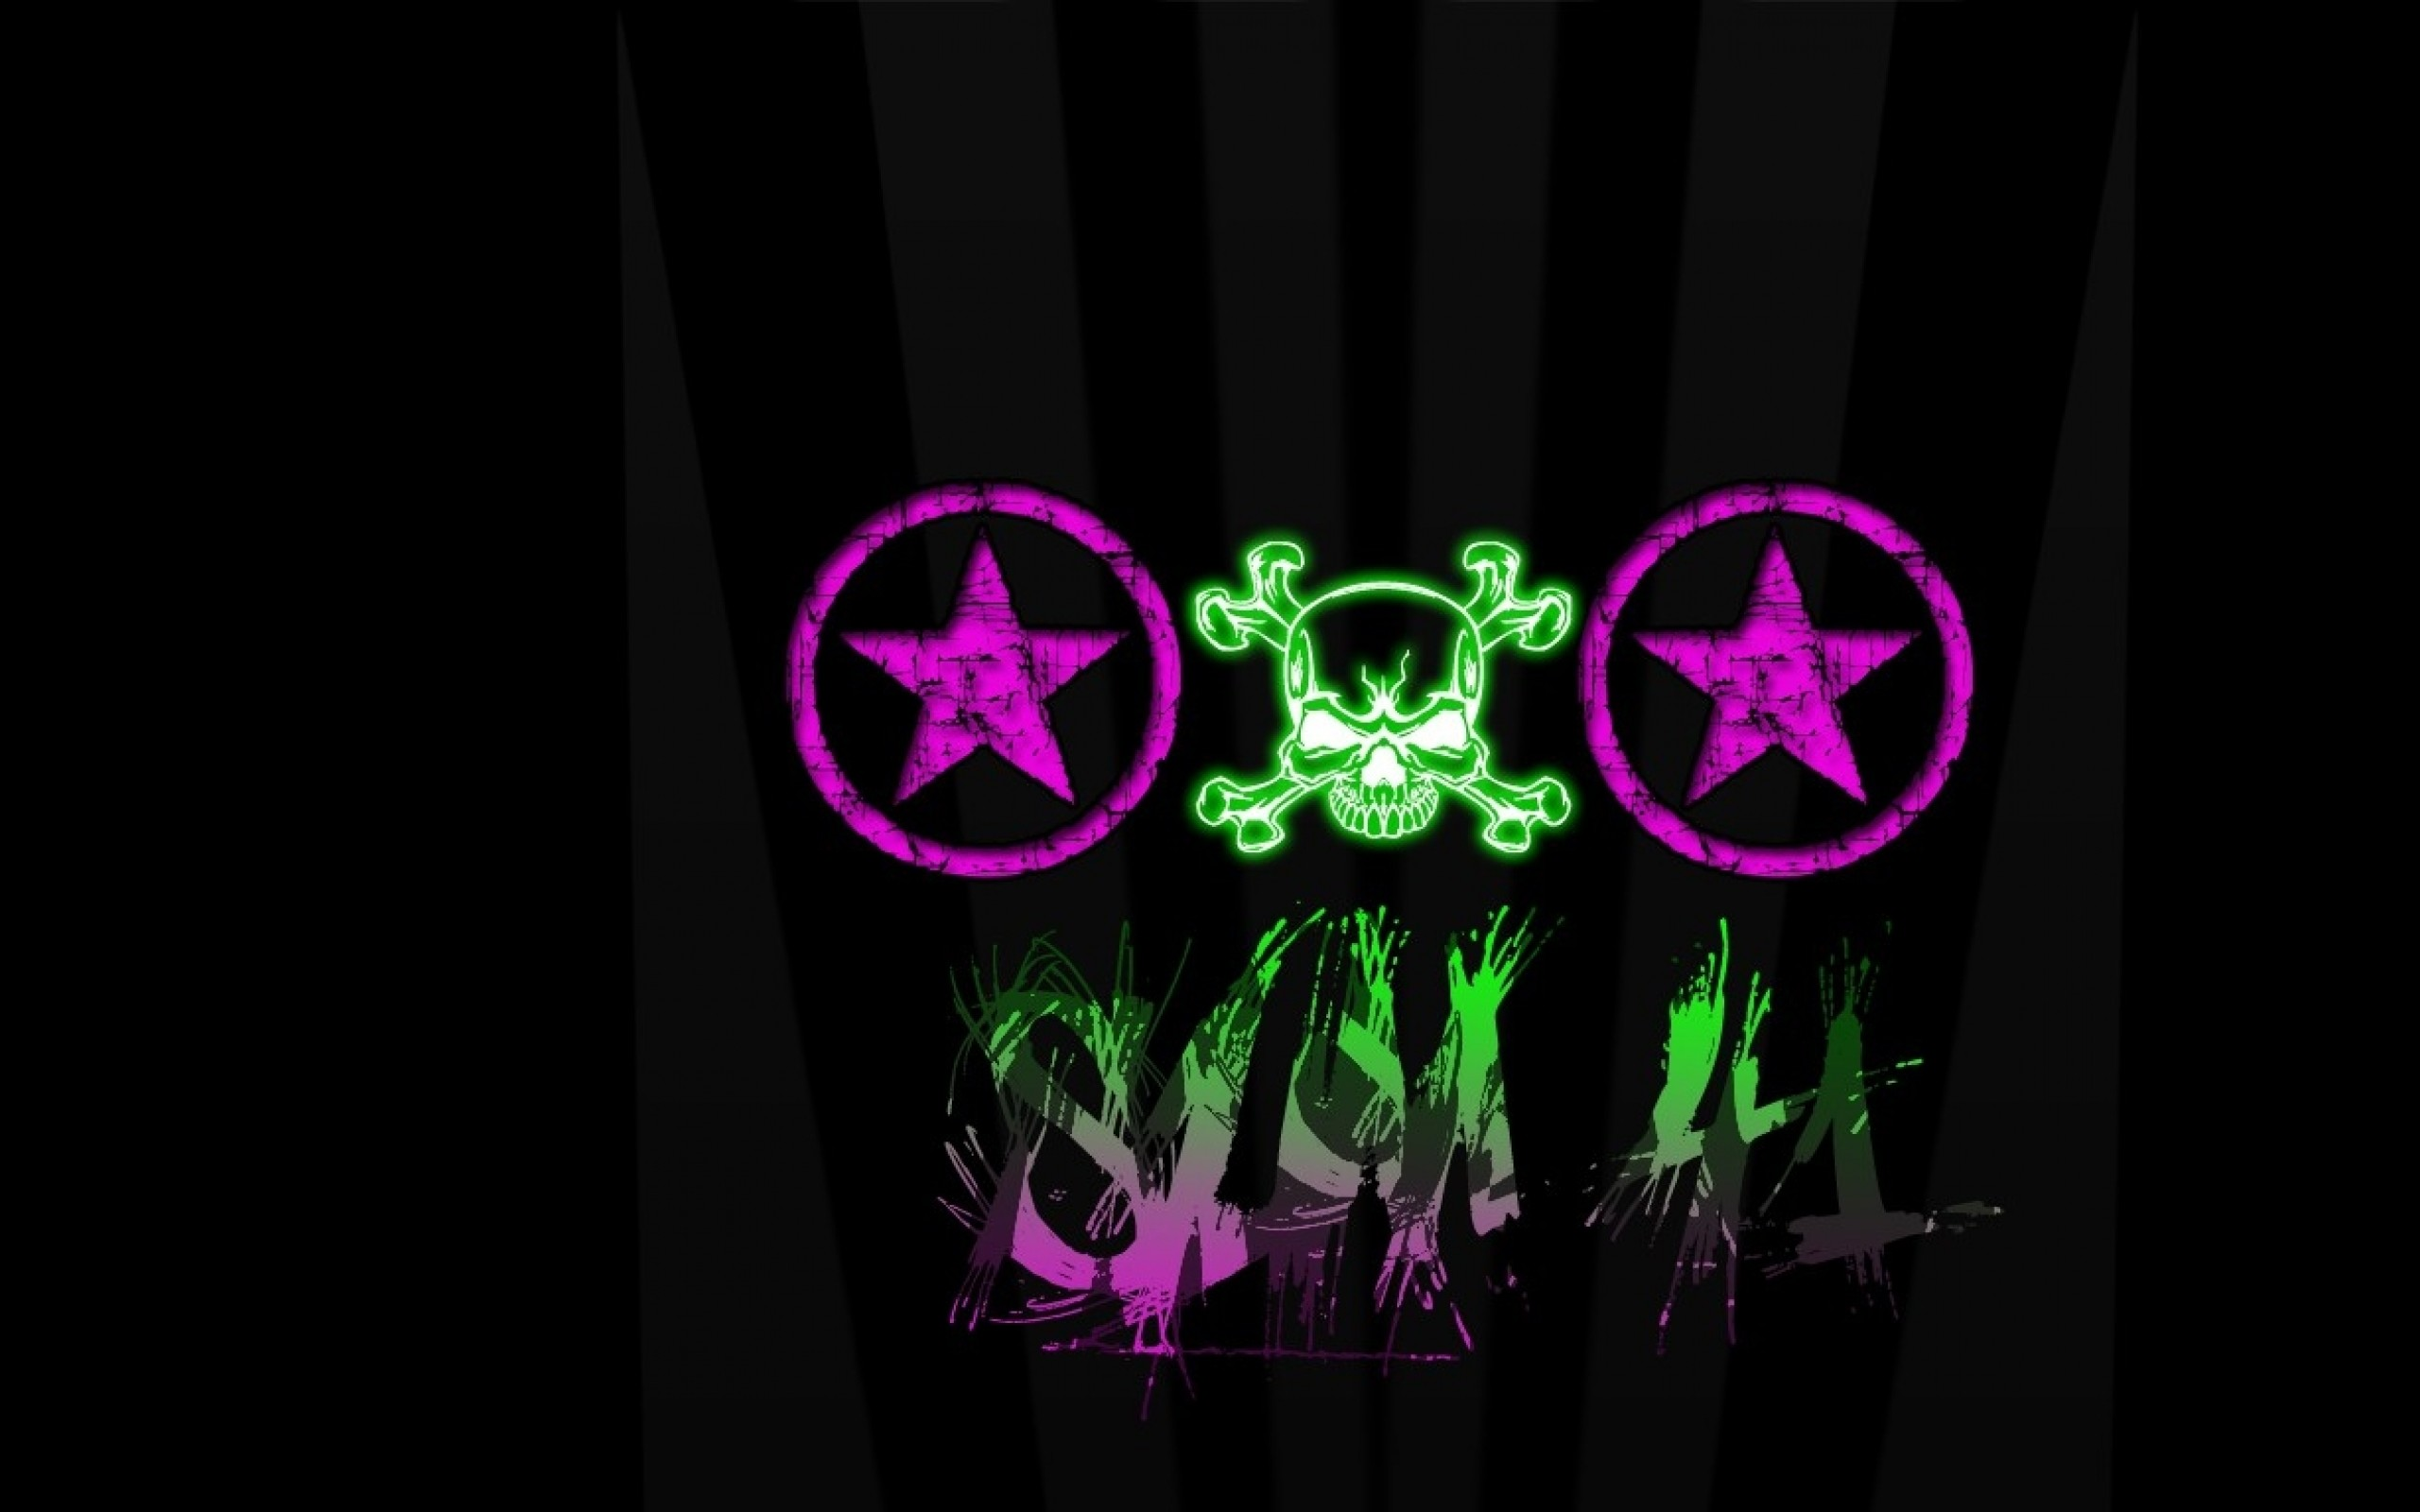 metal band sum 41 punk rock 90s fanart 1366×768 wallpaper Wallpaper HD